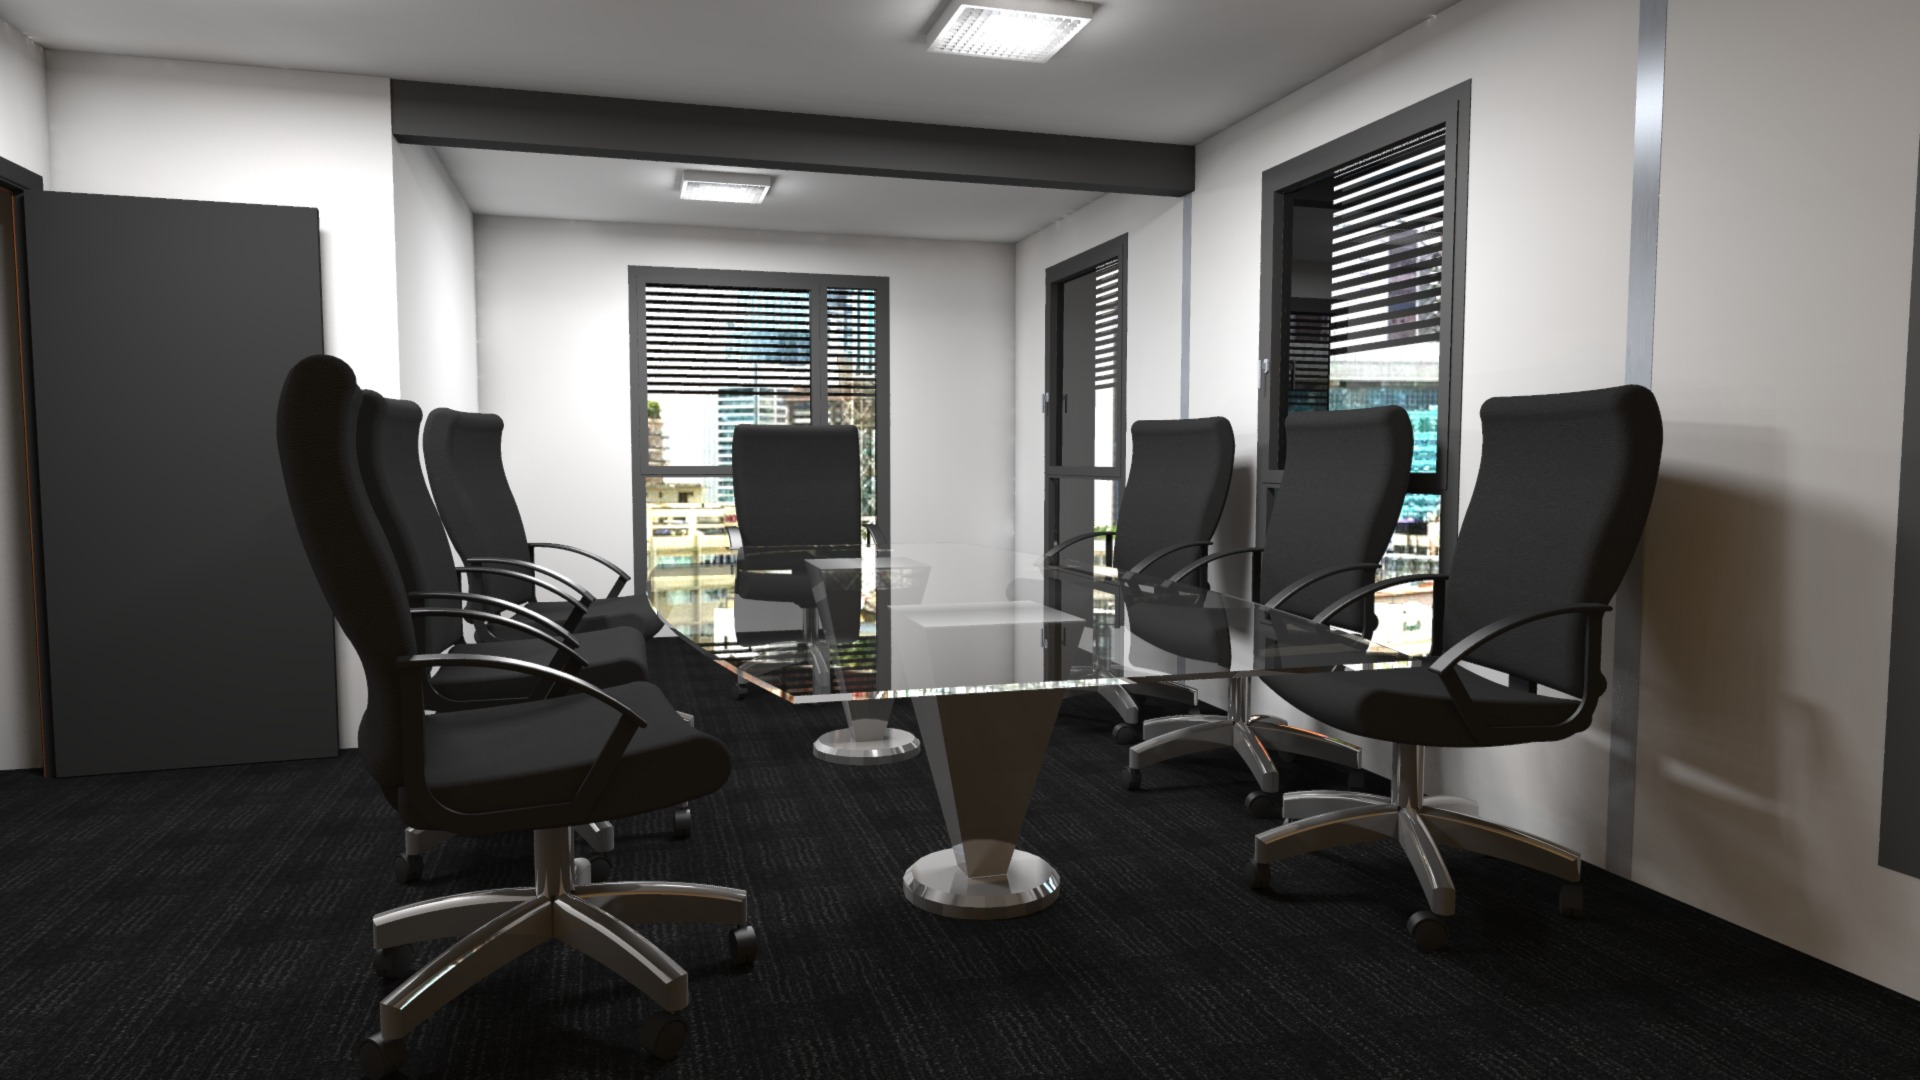 interior-conference-room